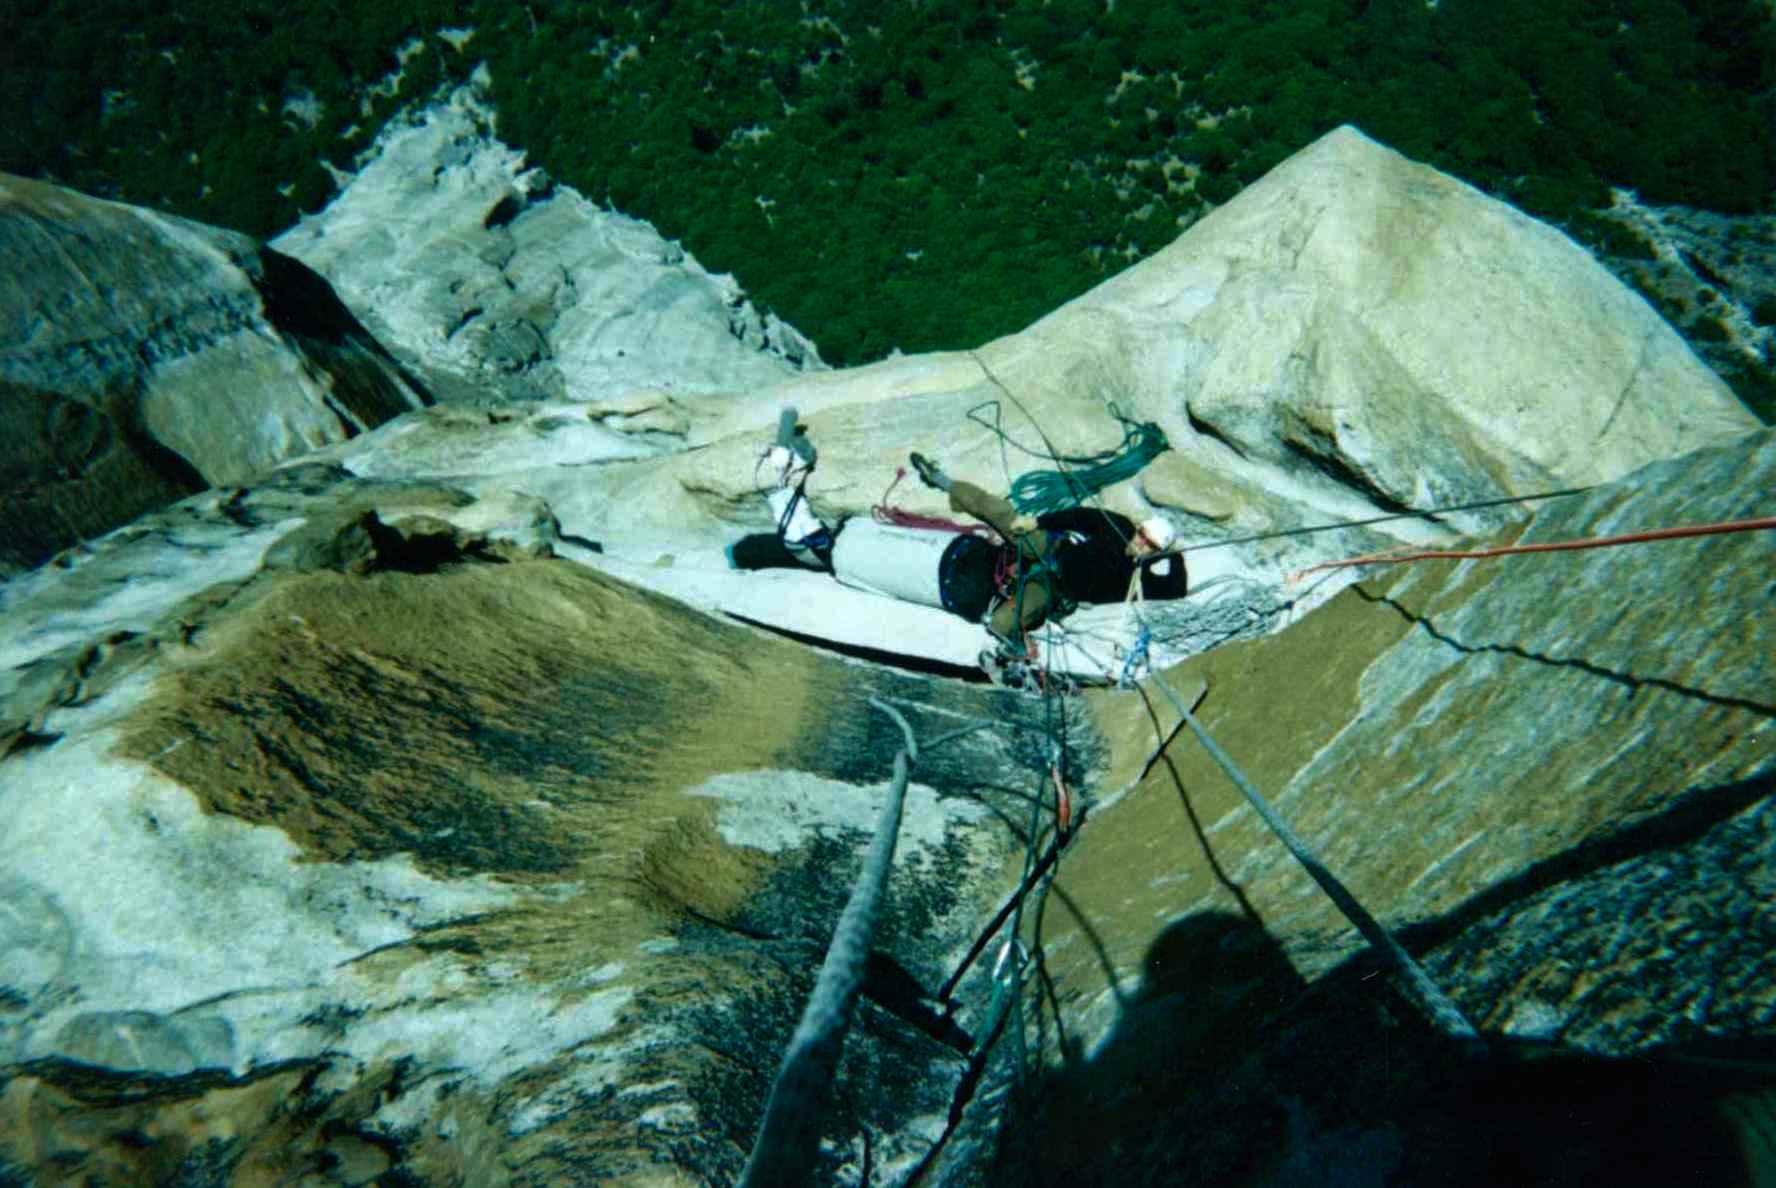 Salathe-near summit-2005.jpg